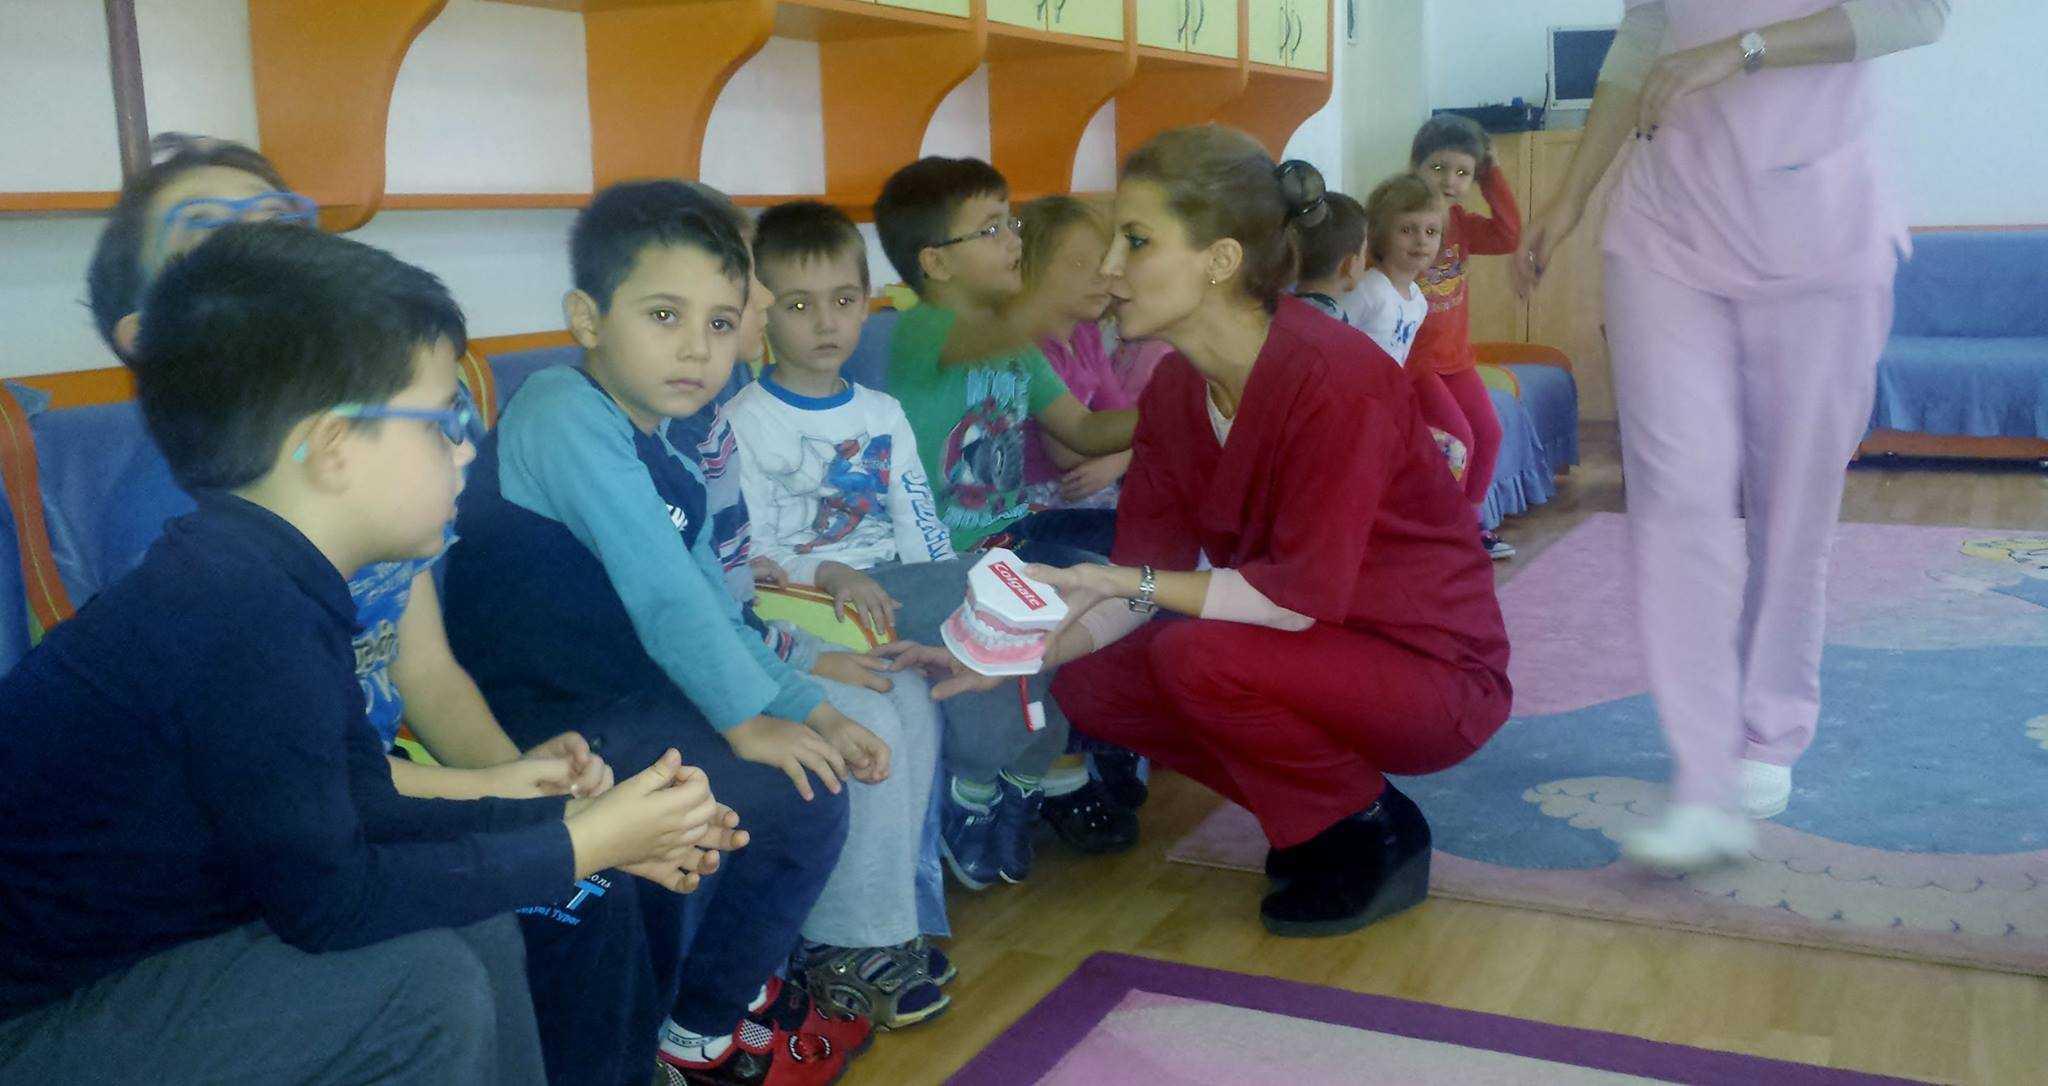 Prescolarii Gradinitei 44 Constanta au avut intalnire cu medicul stomatolog